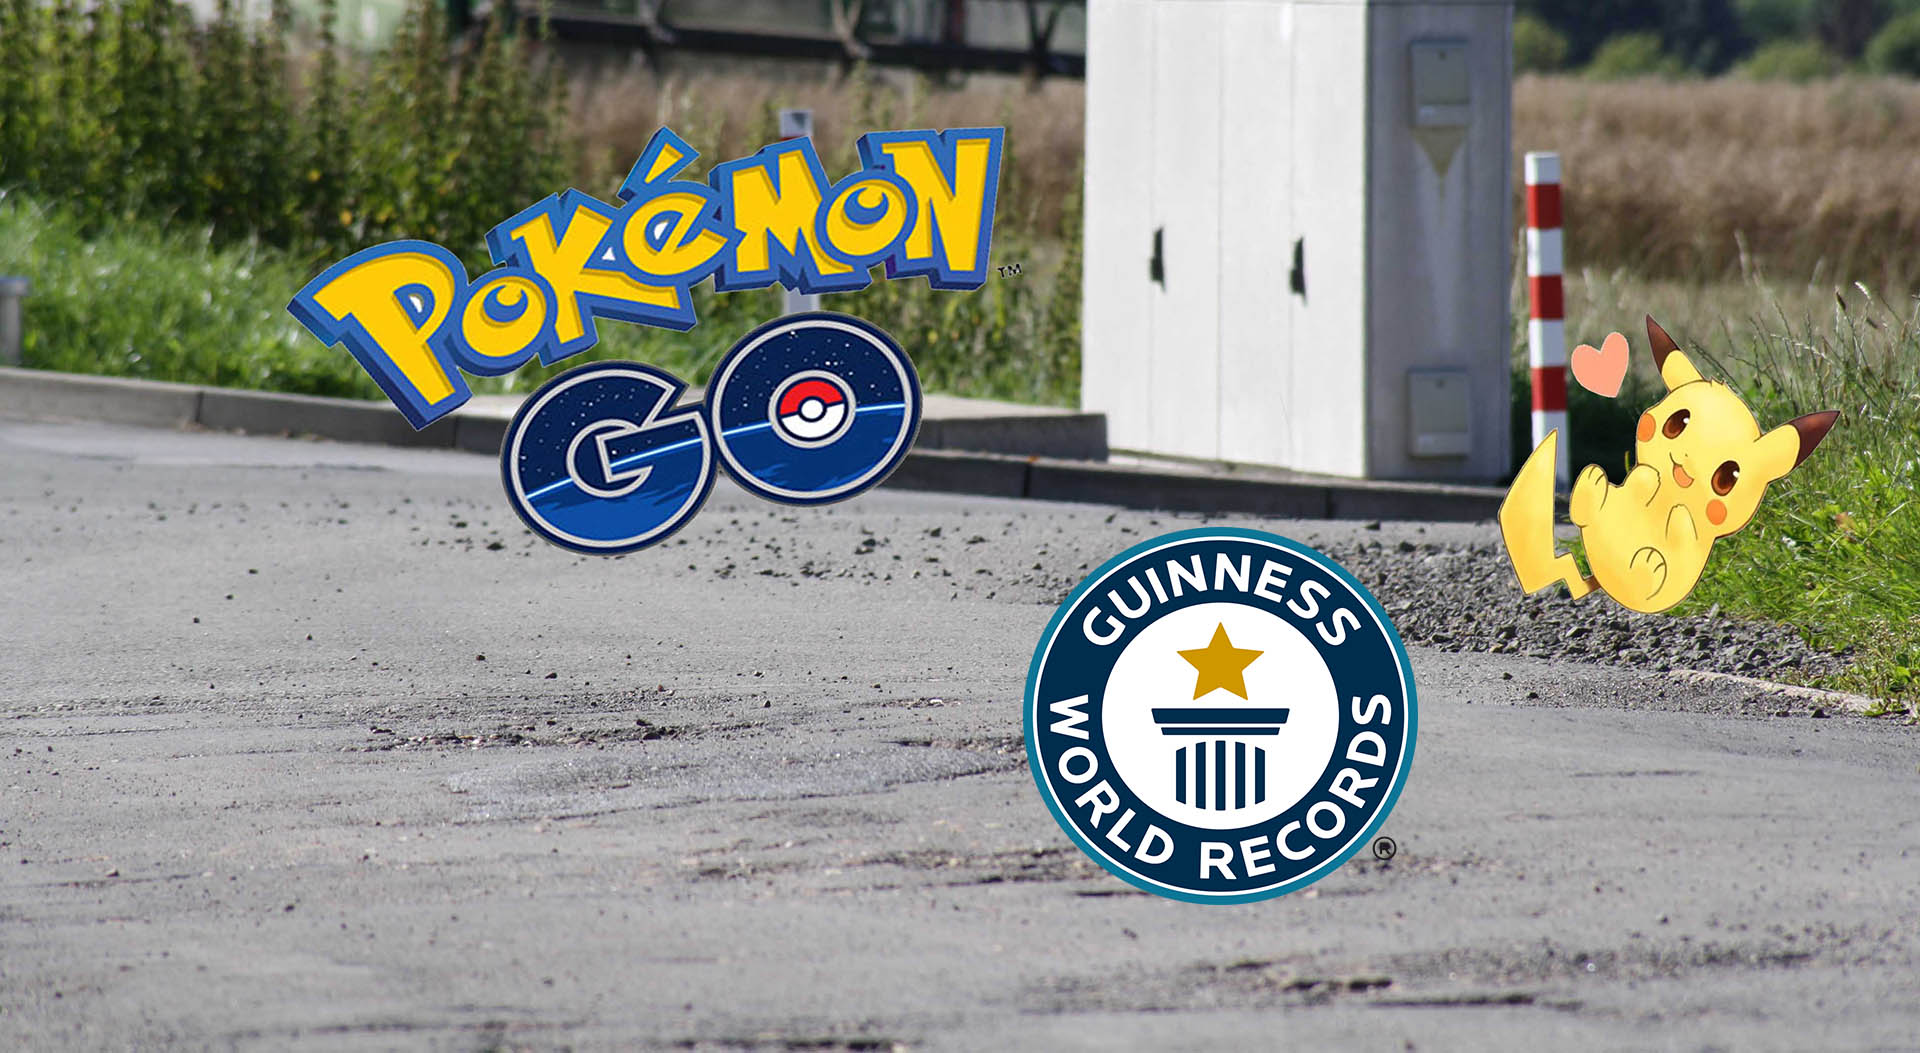 Pokémon GO hat 5 Guiness-World-Records gebrochen